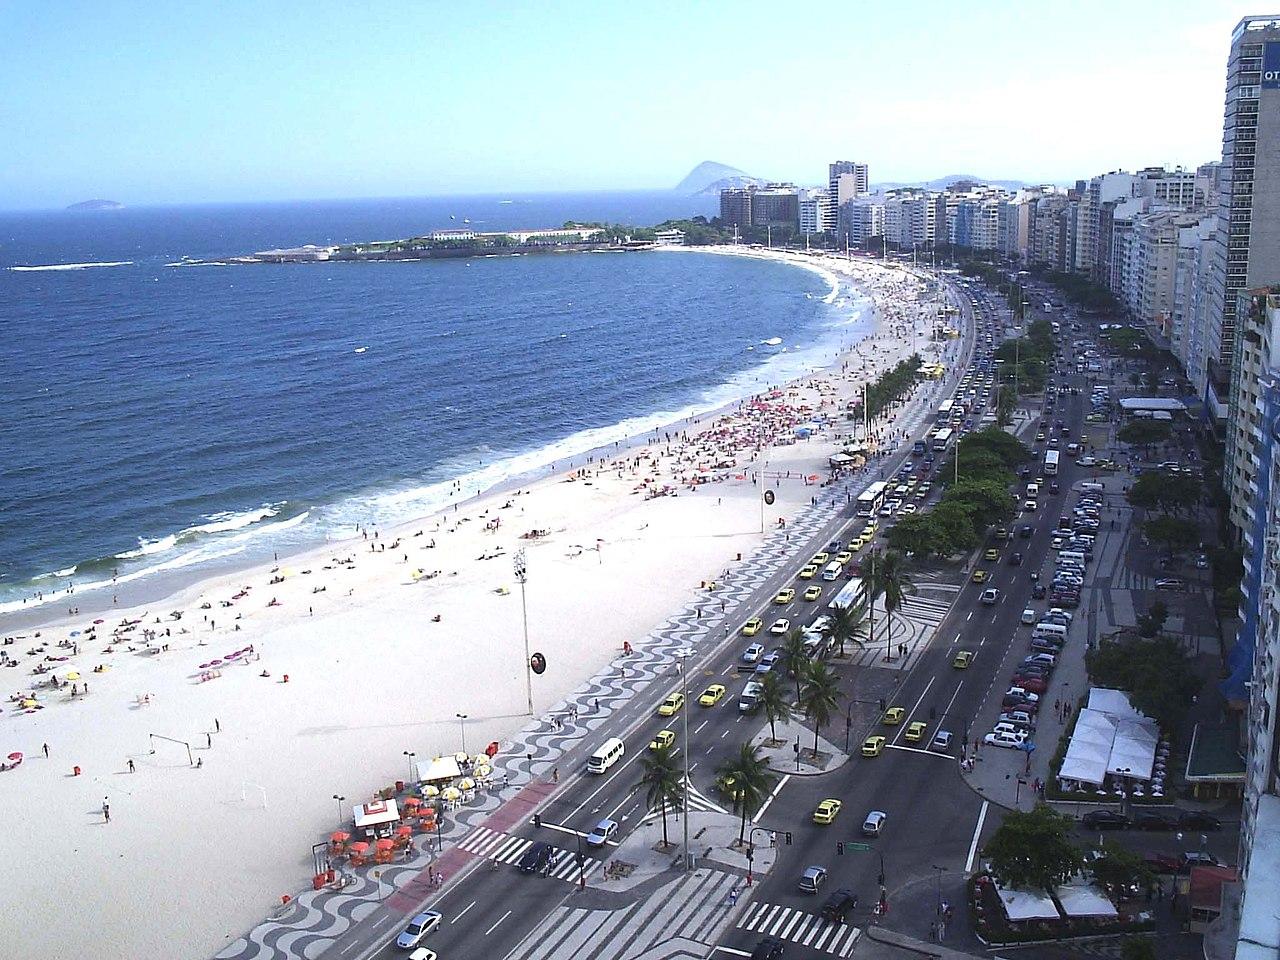 CopacabanaBeach RiodeJaneiro.jpg